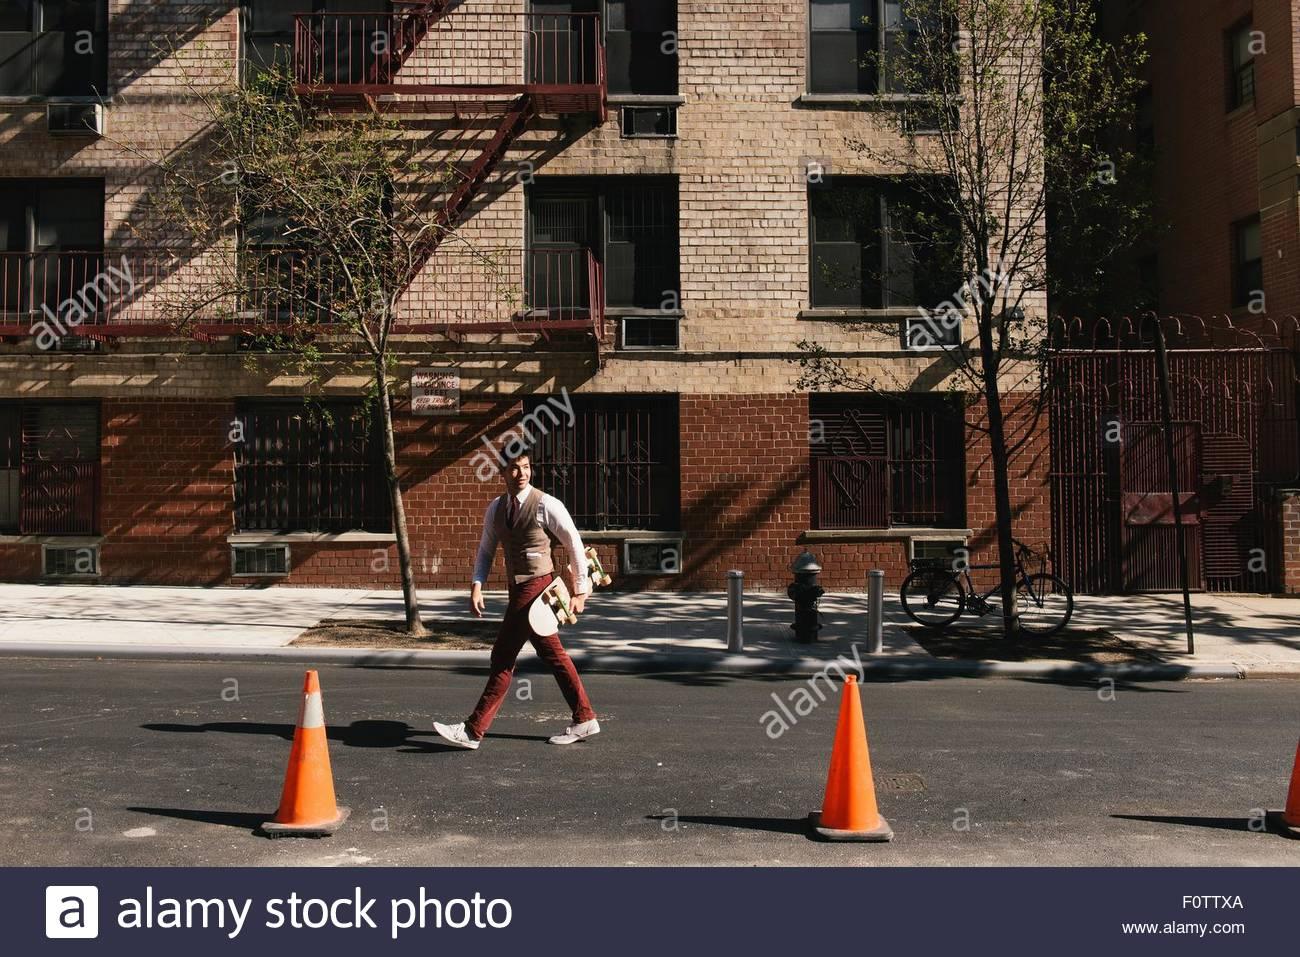 Maschio elegante guidatore di skateboard camminando lungo la strada, West Village, Manhattan STATI UNITI D'AMERICA Immagini Stock